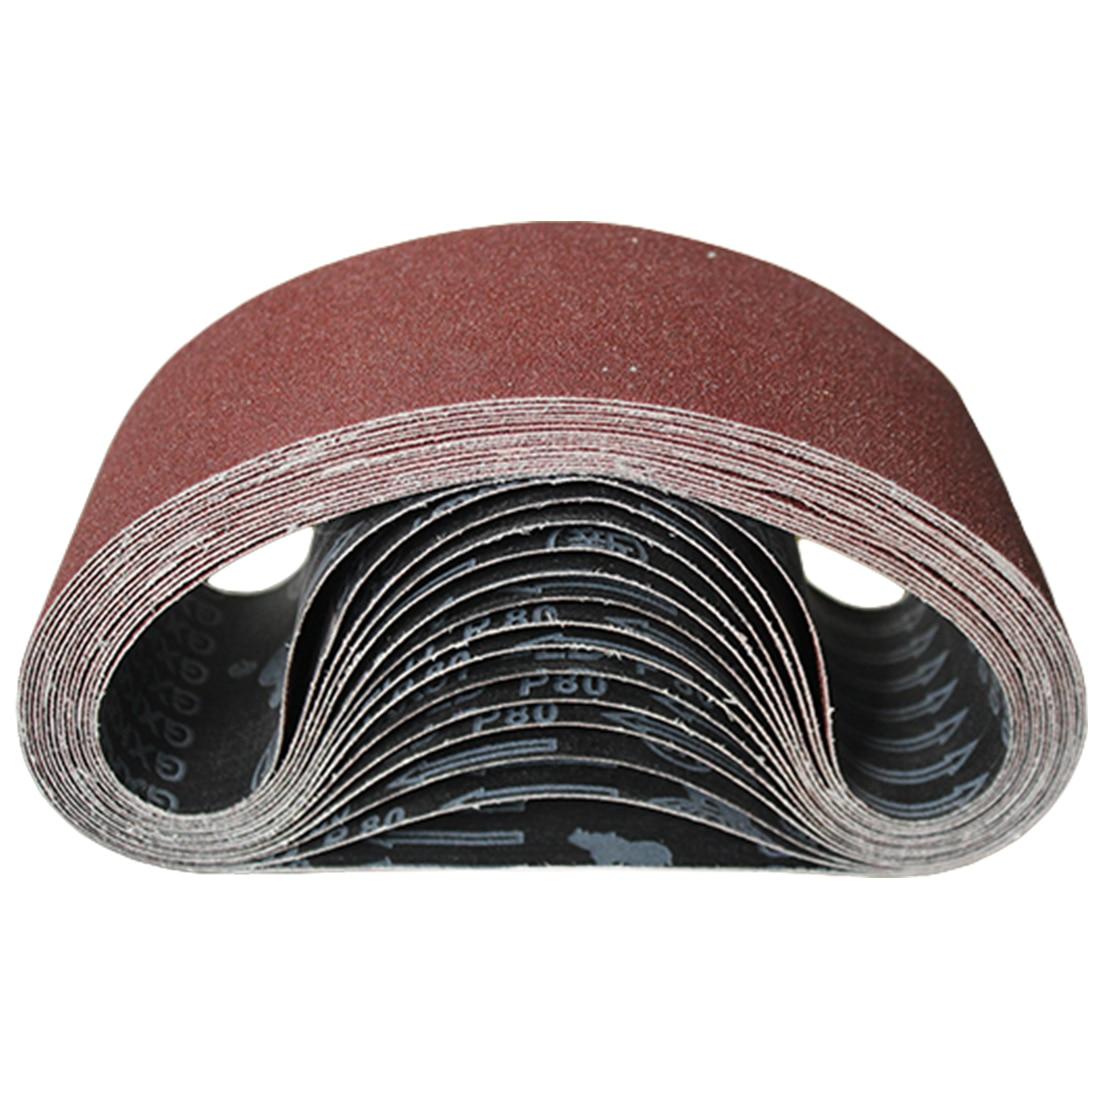 60-600 Grits Sandpaper Abrasive Bands Sanding Belts For Sander Power Rotary Tools Dremel Accessories Abrasive Tool